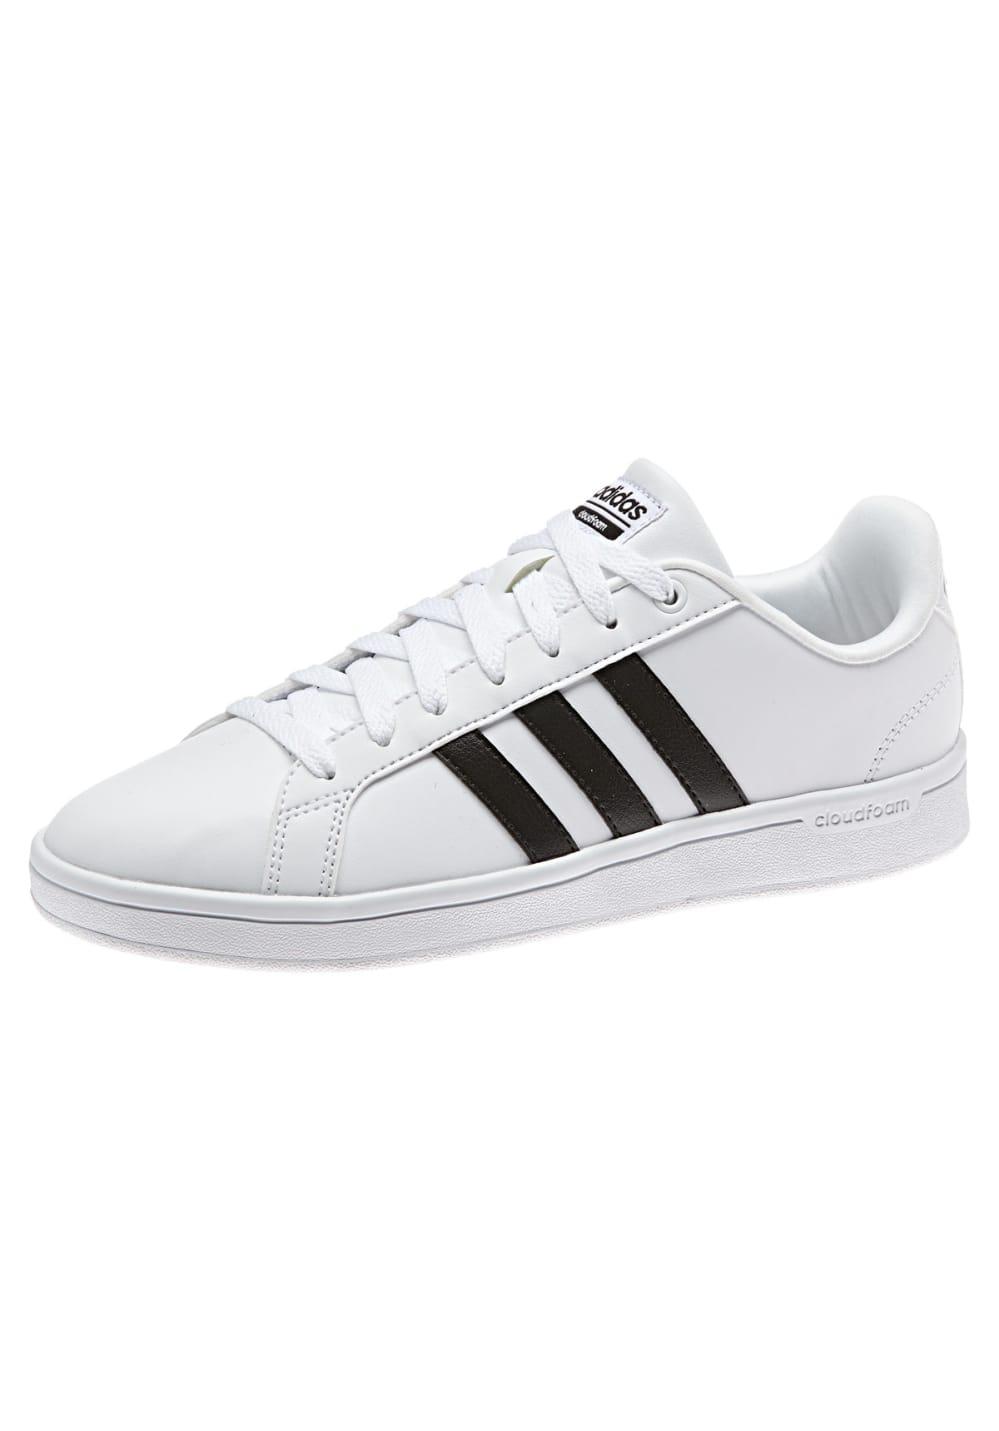 adidas neo Cloudfoam Advantage Sneaker für Damen Grau